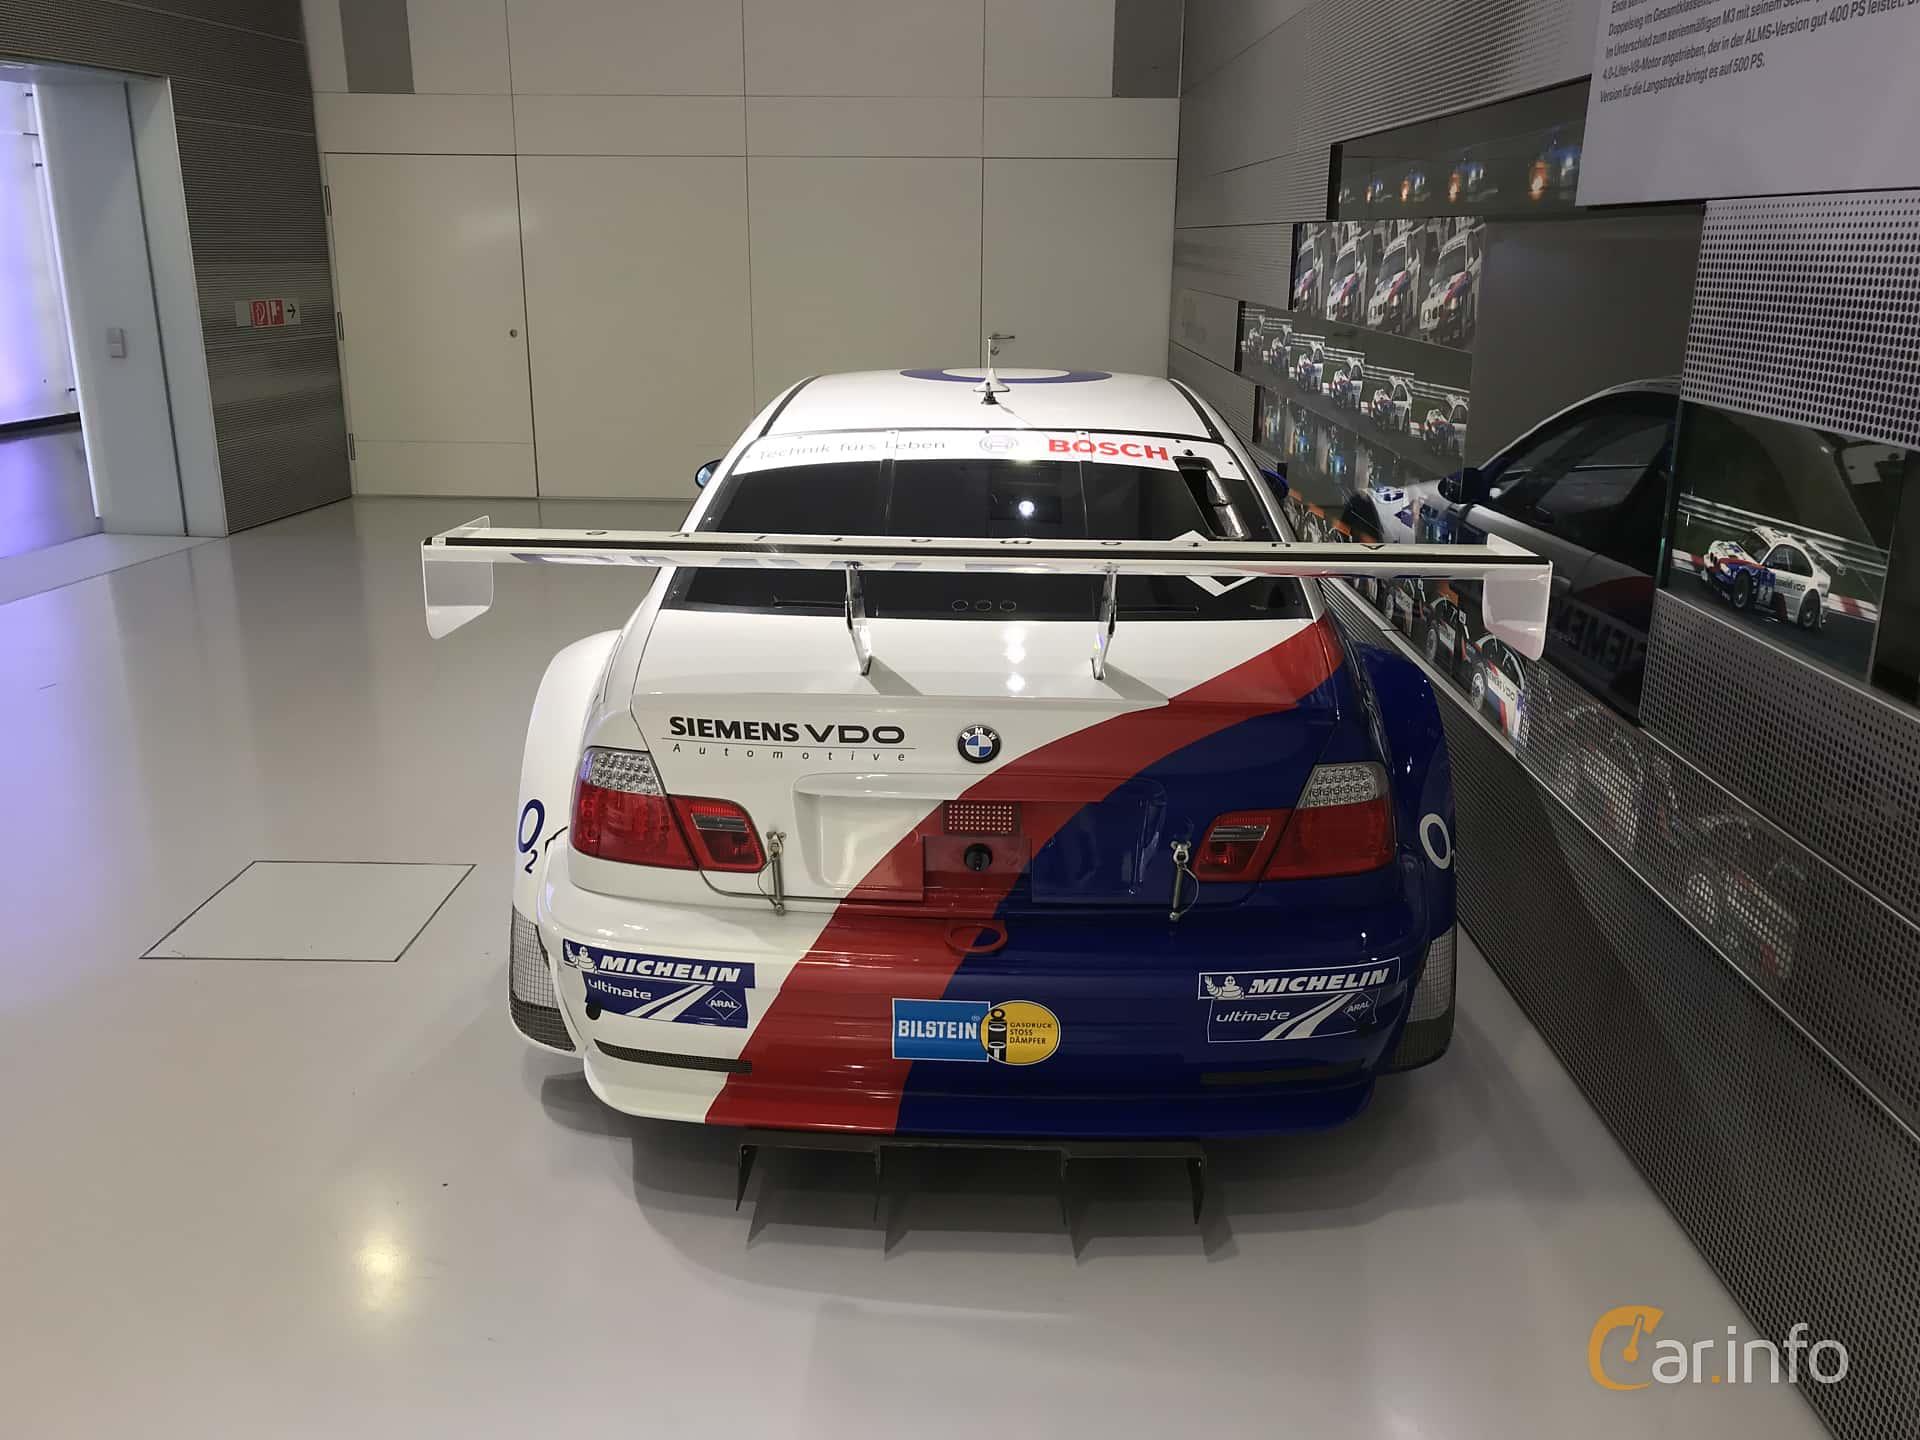 BMW M3 GTR GT2  Manual, 500hp, 2004